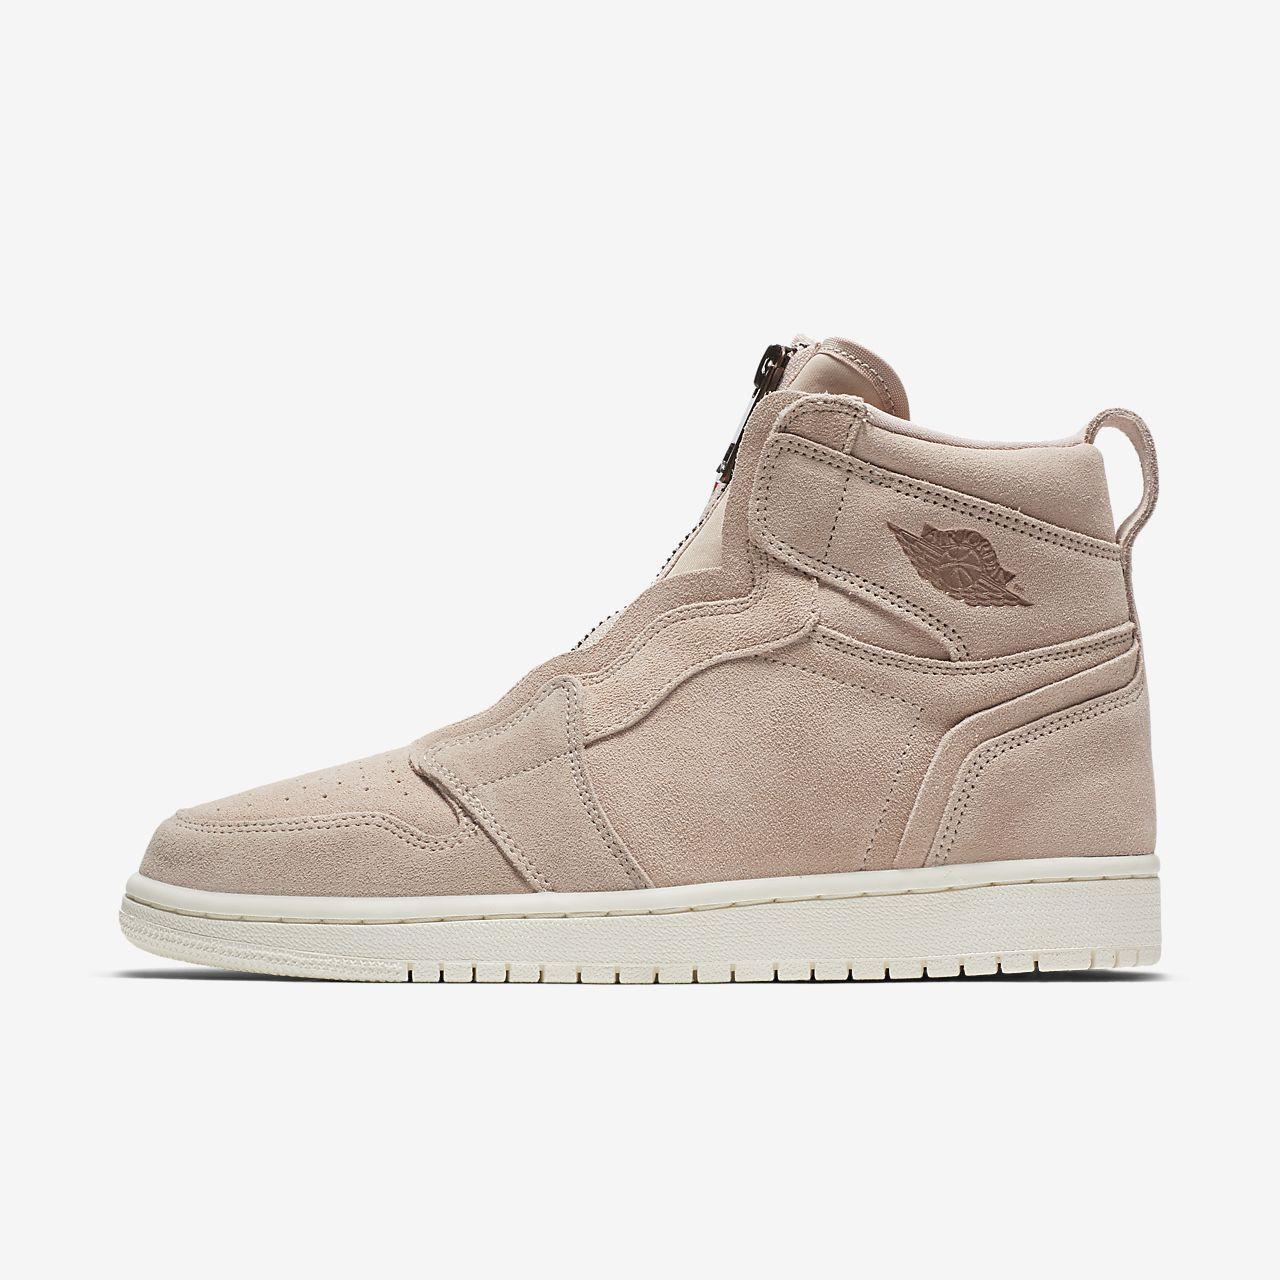 Chaussure Air Jordan 1 High Zip pour Femme